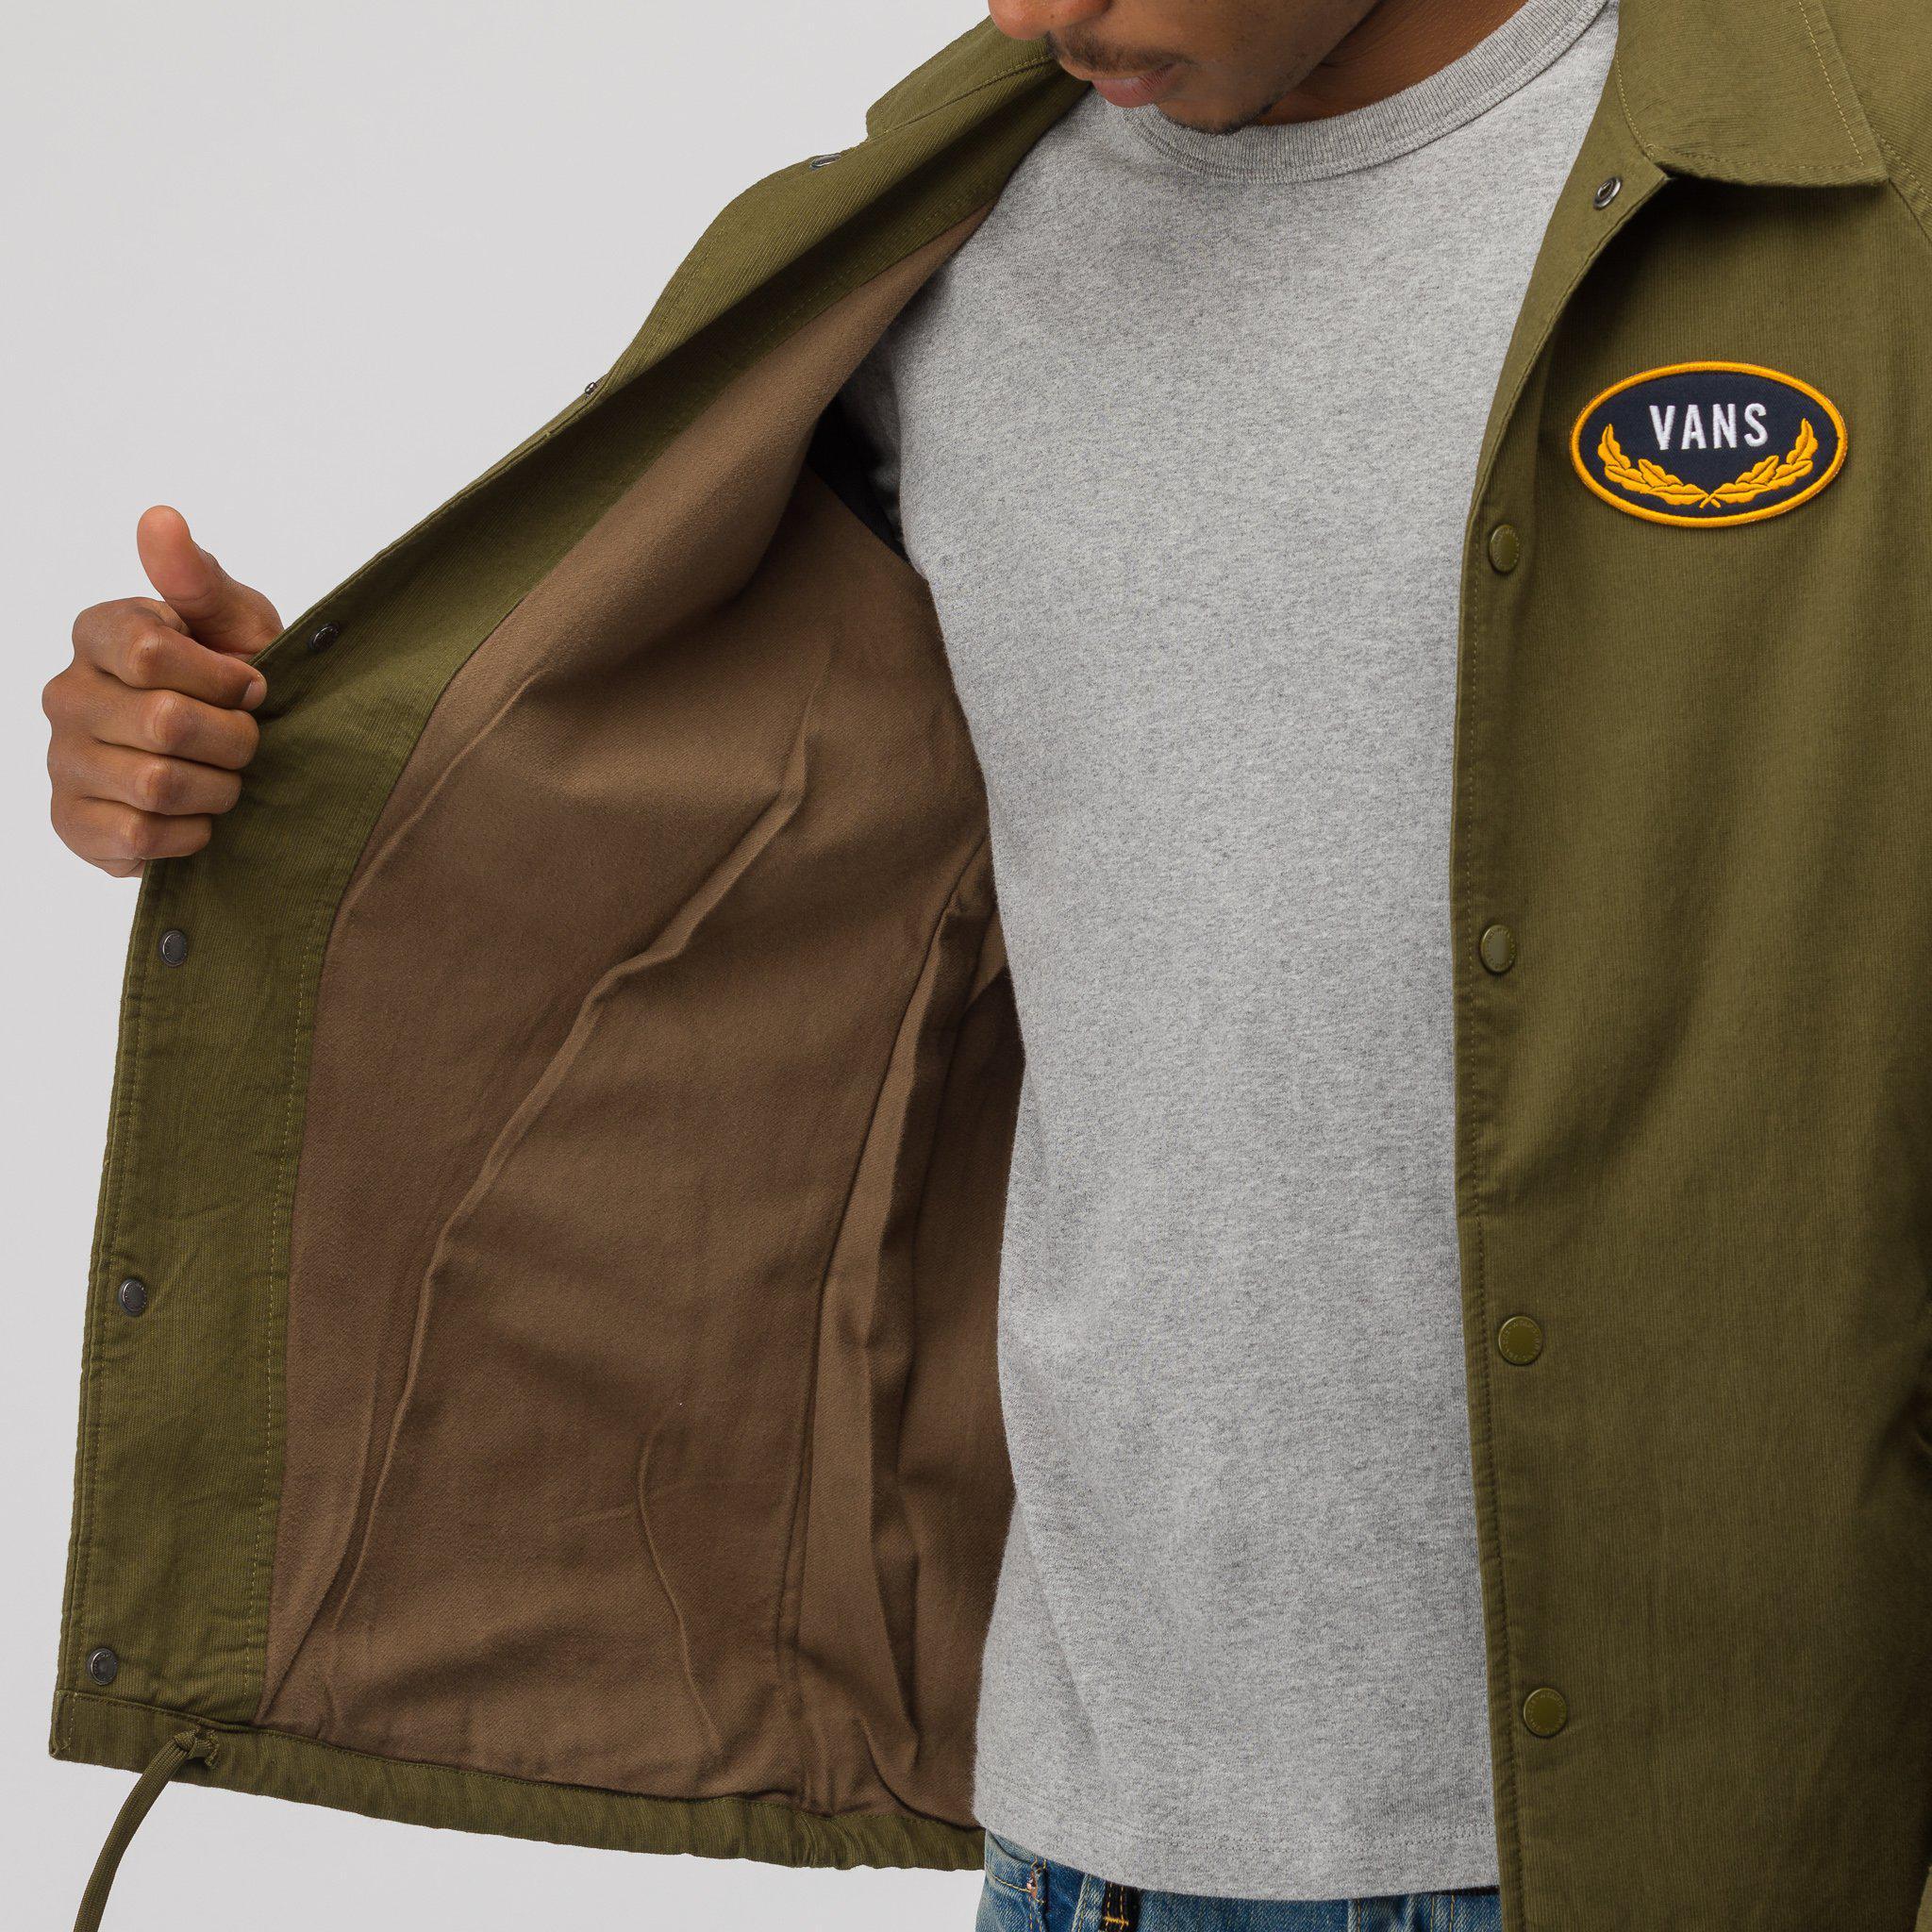 b28e1363d7c8 Lyst - Vans X Wtaps Torrey Coaches Jacket In Olive in Green for Men